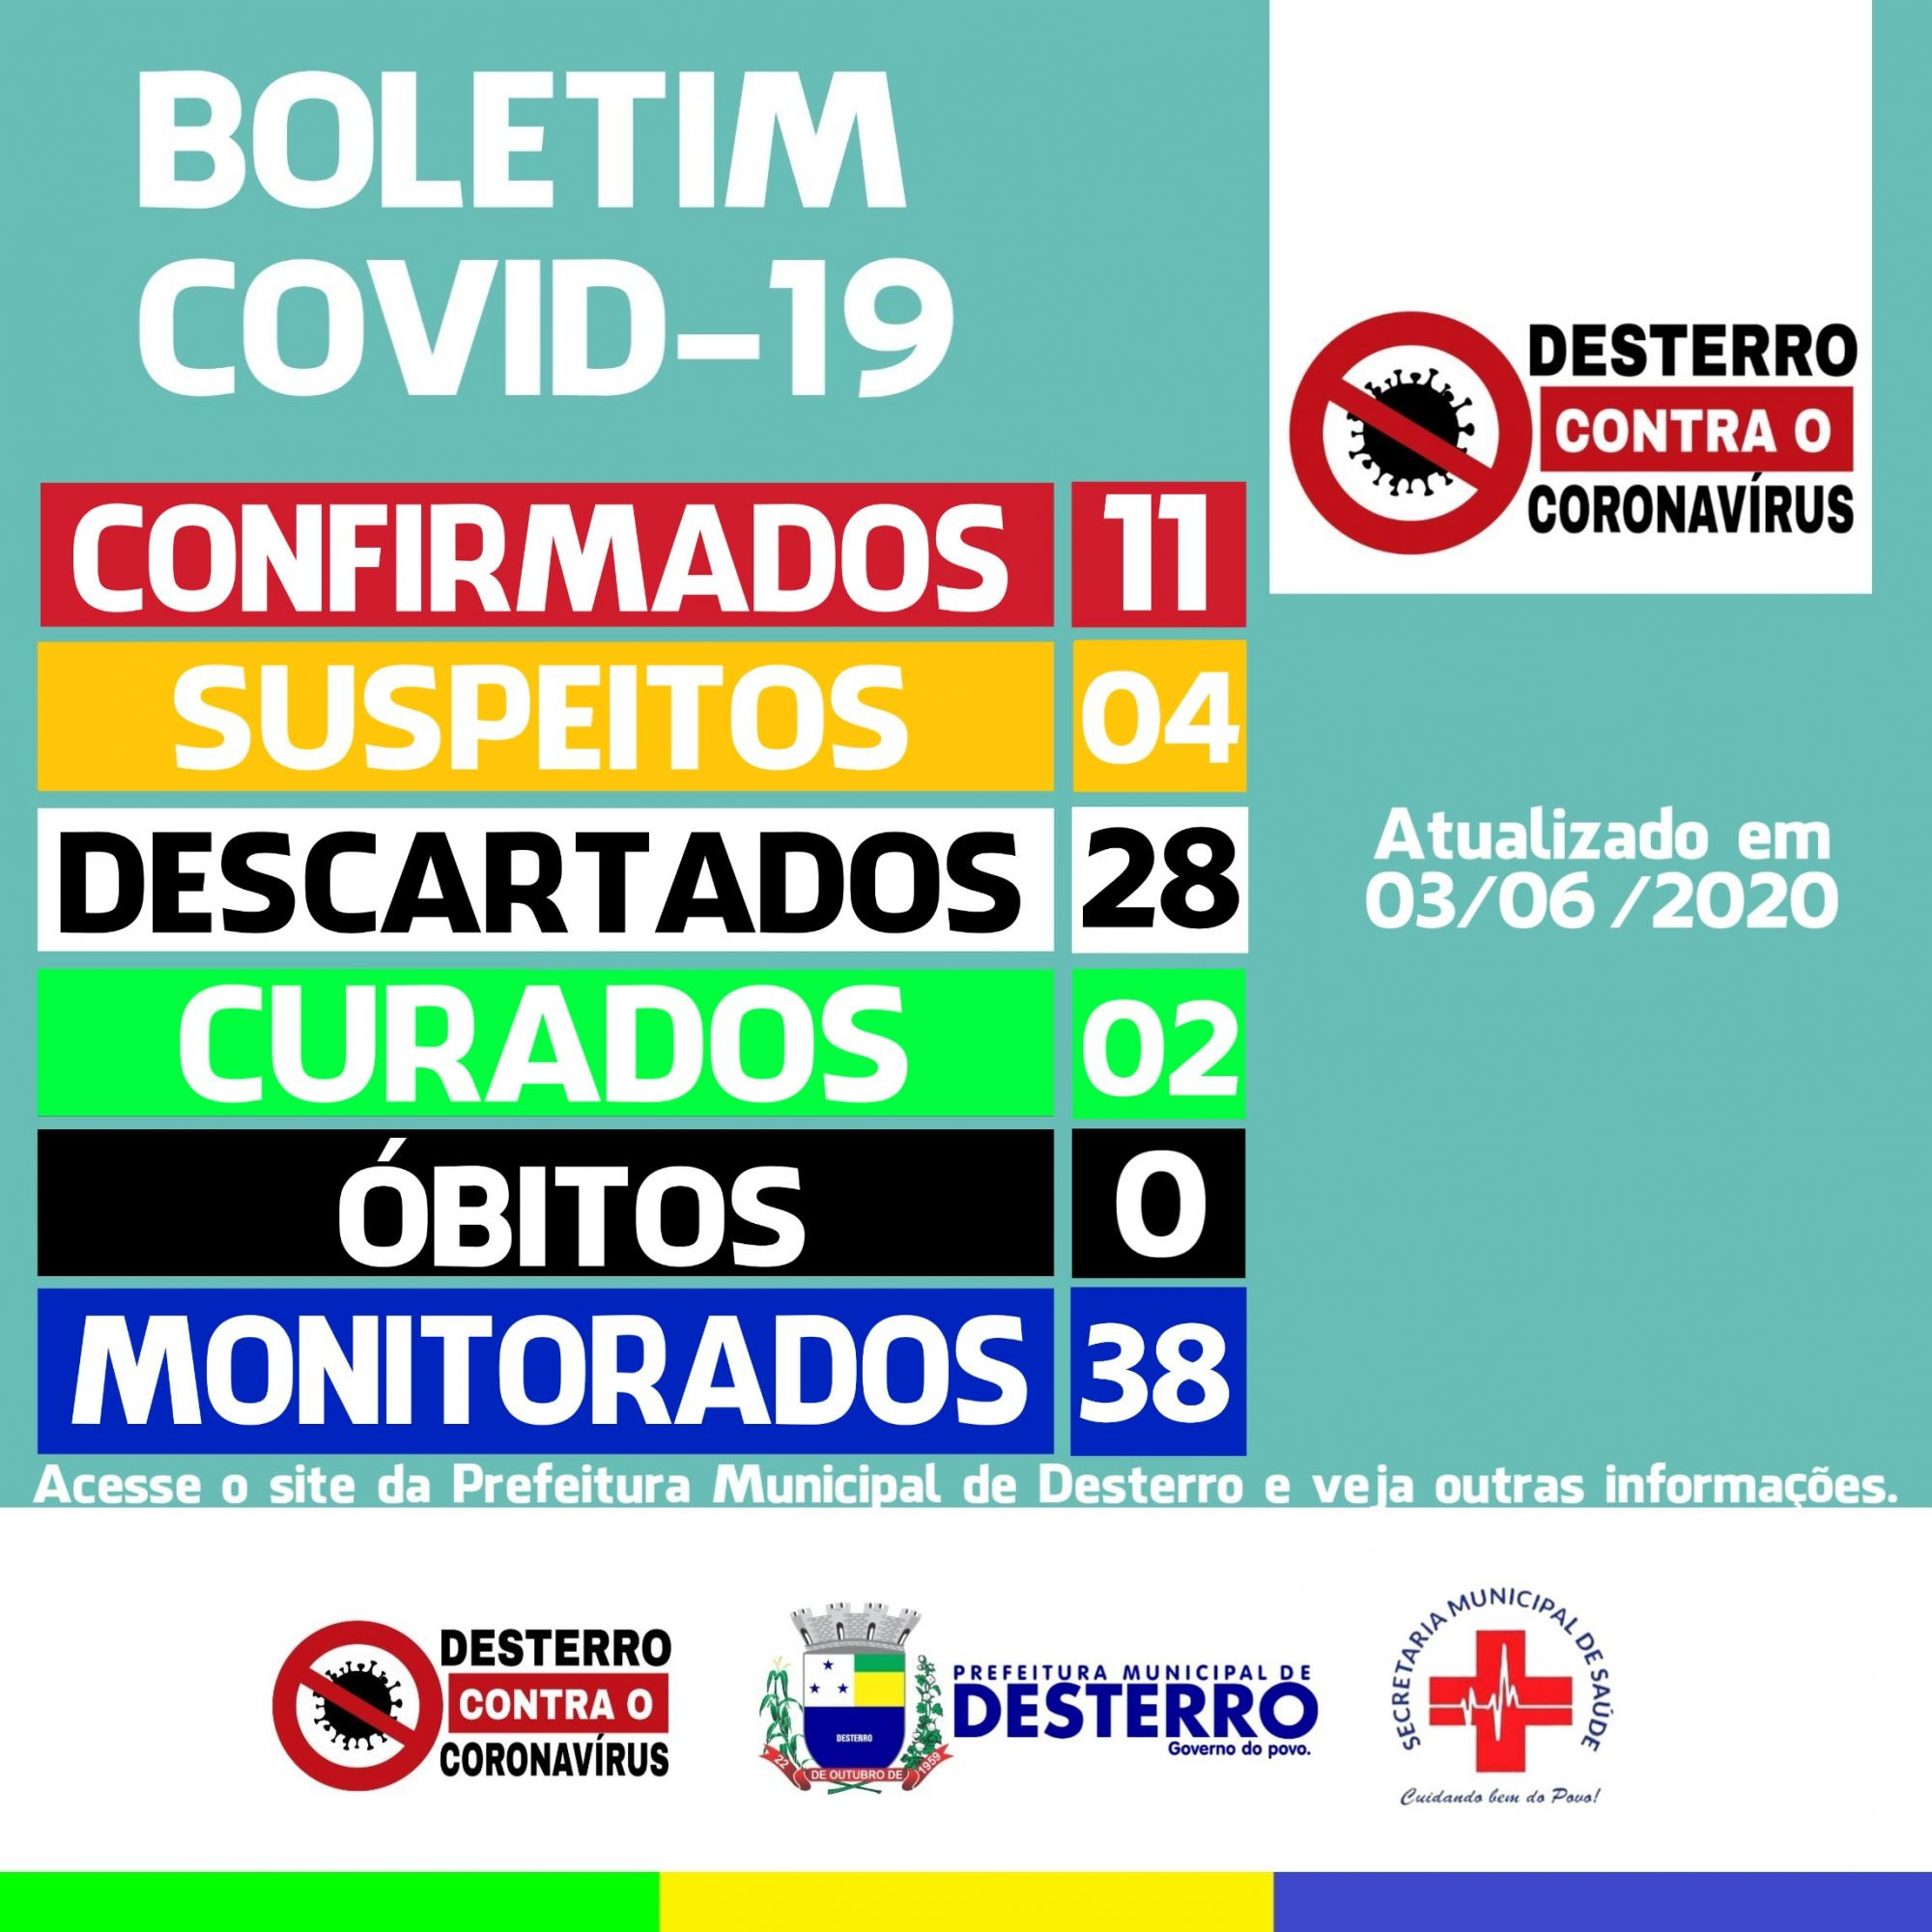 Boletim Covid-19 (03/06/2020)